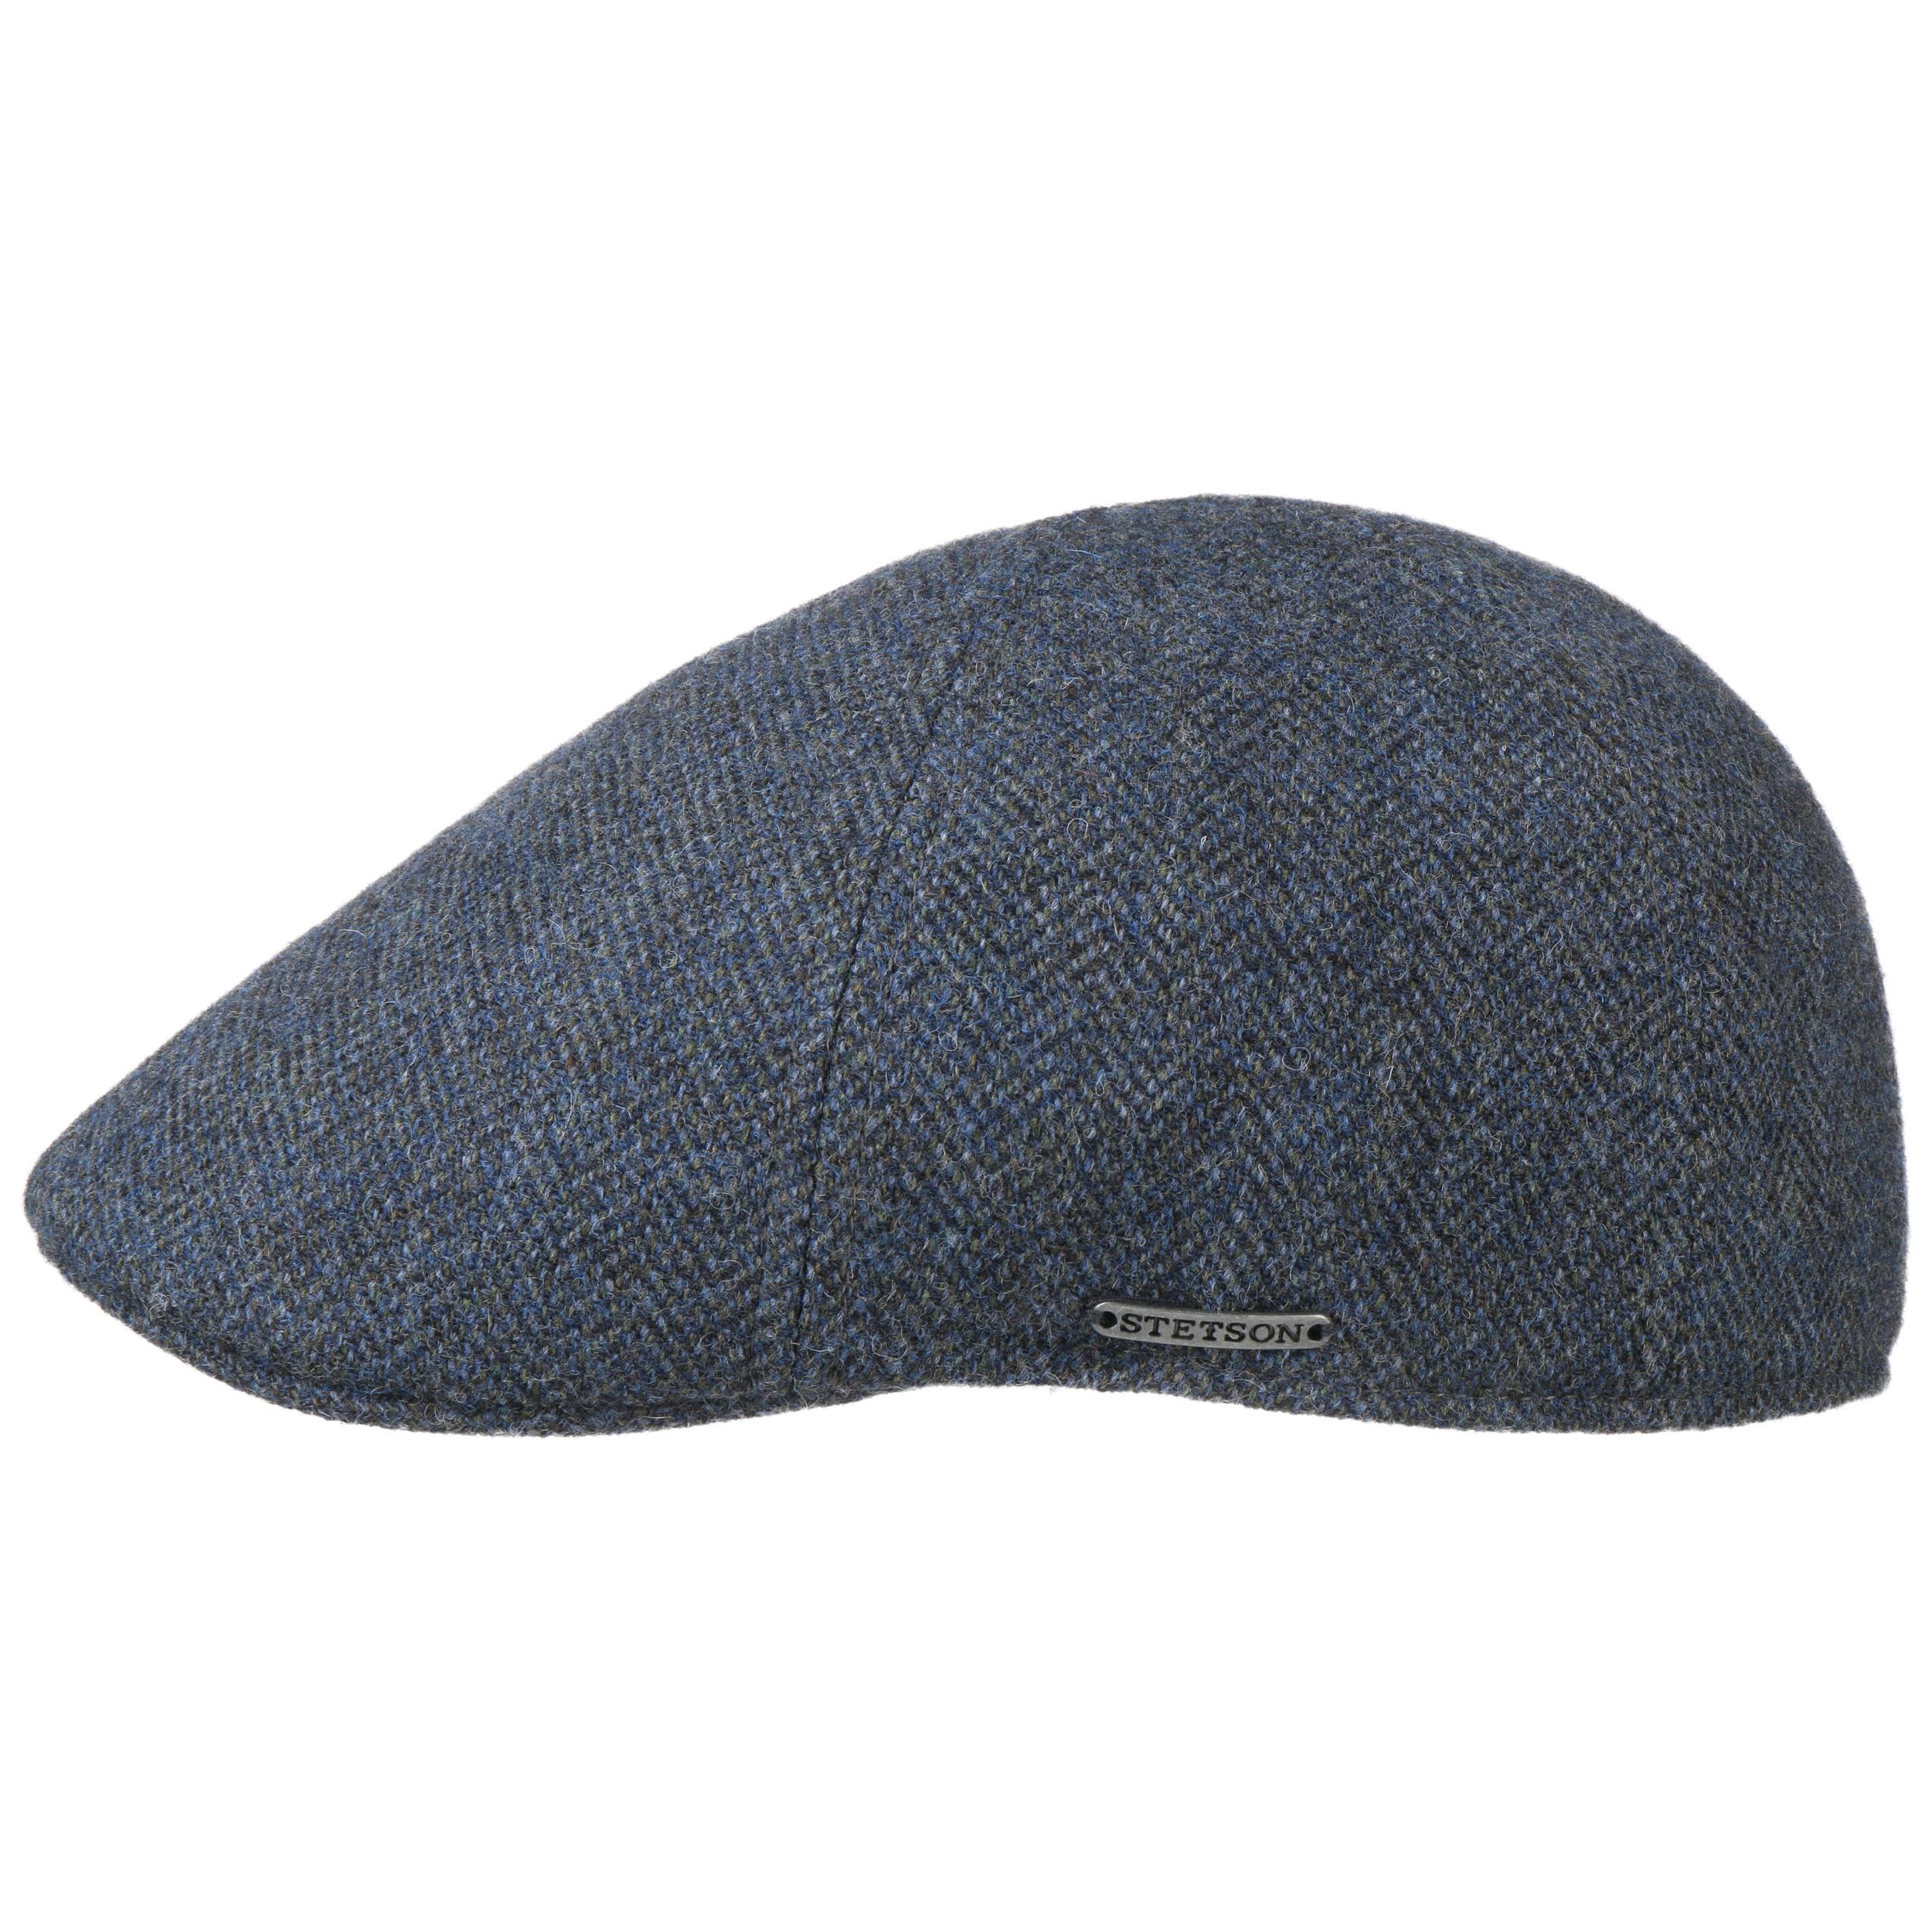 Made in The EU Winter Flat hat with Peak Stetson Texas Wool Herringbone Cap Men Lining Autumn-Winter